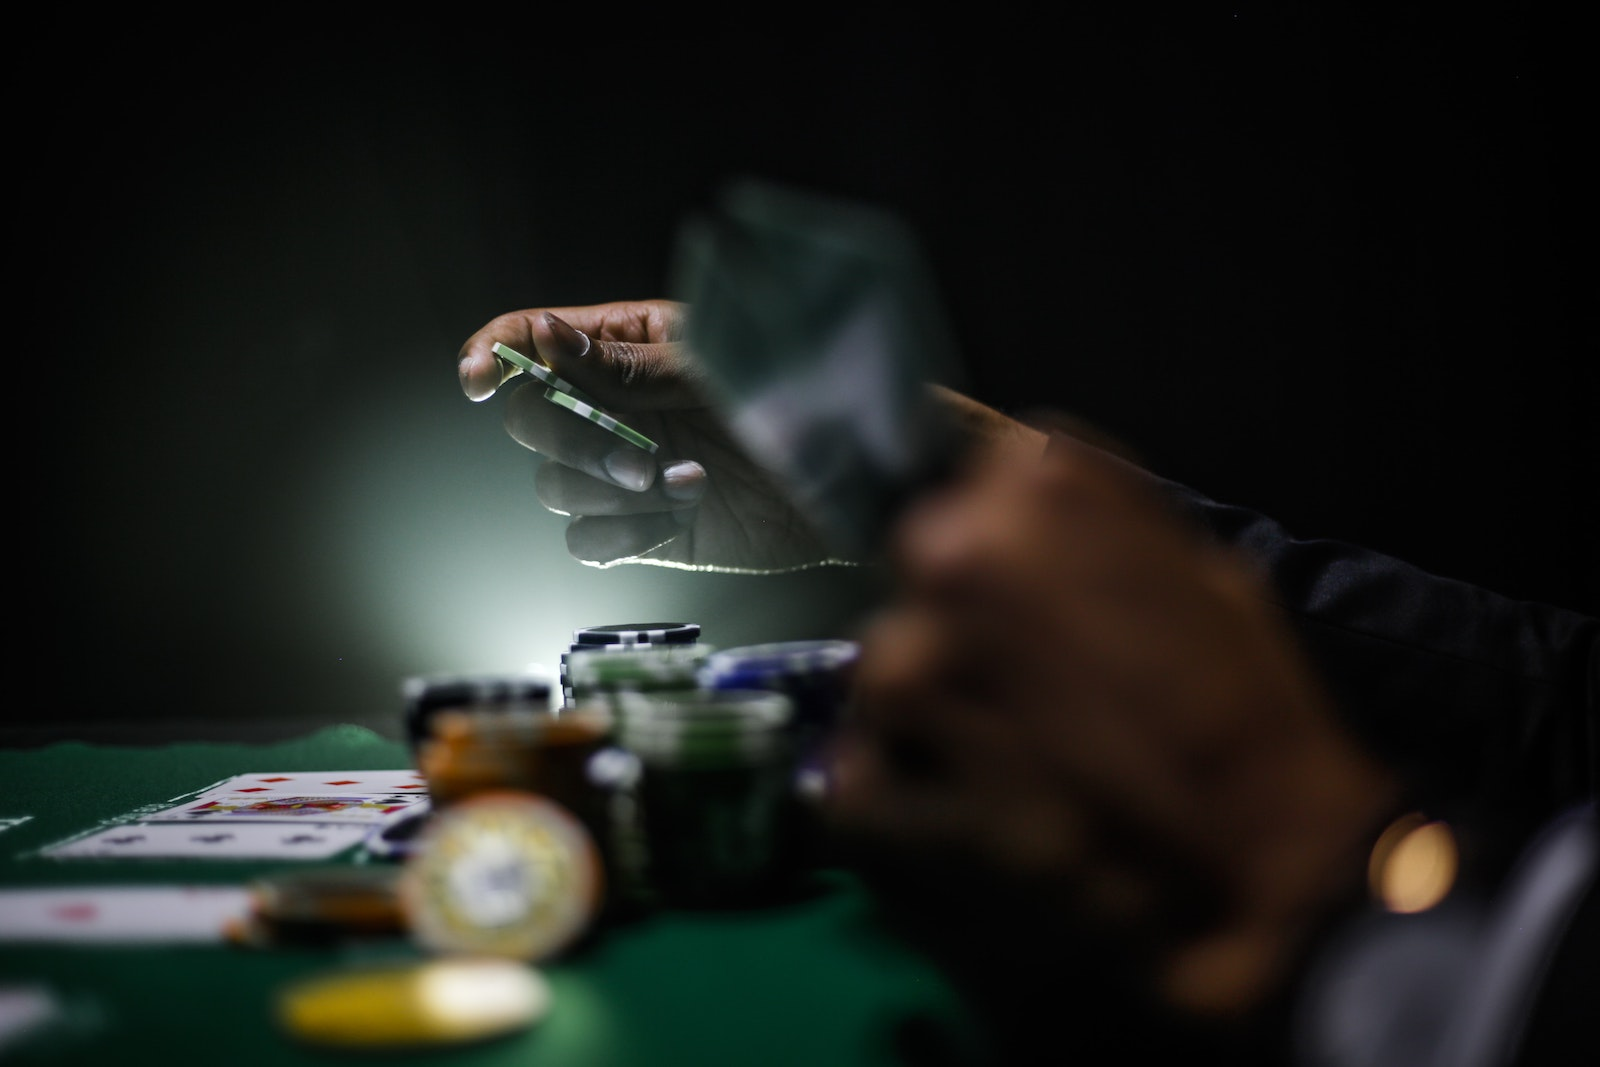 Libromania #13: Dostoevsky's Gambling Problem